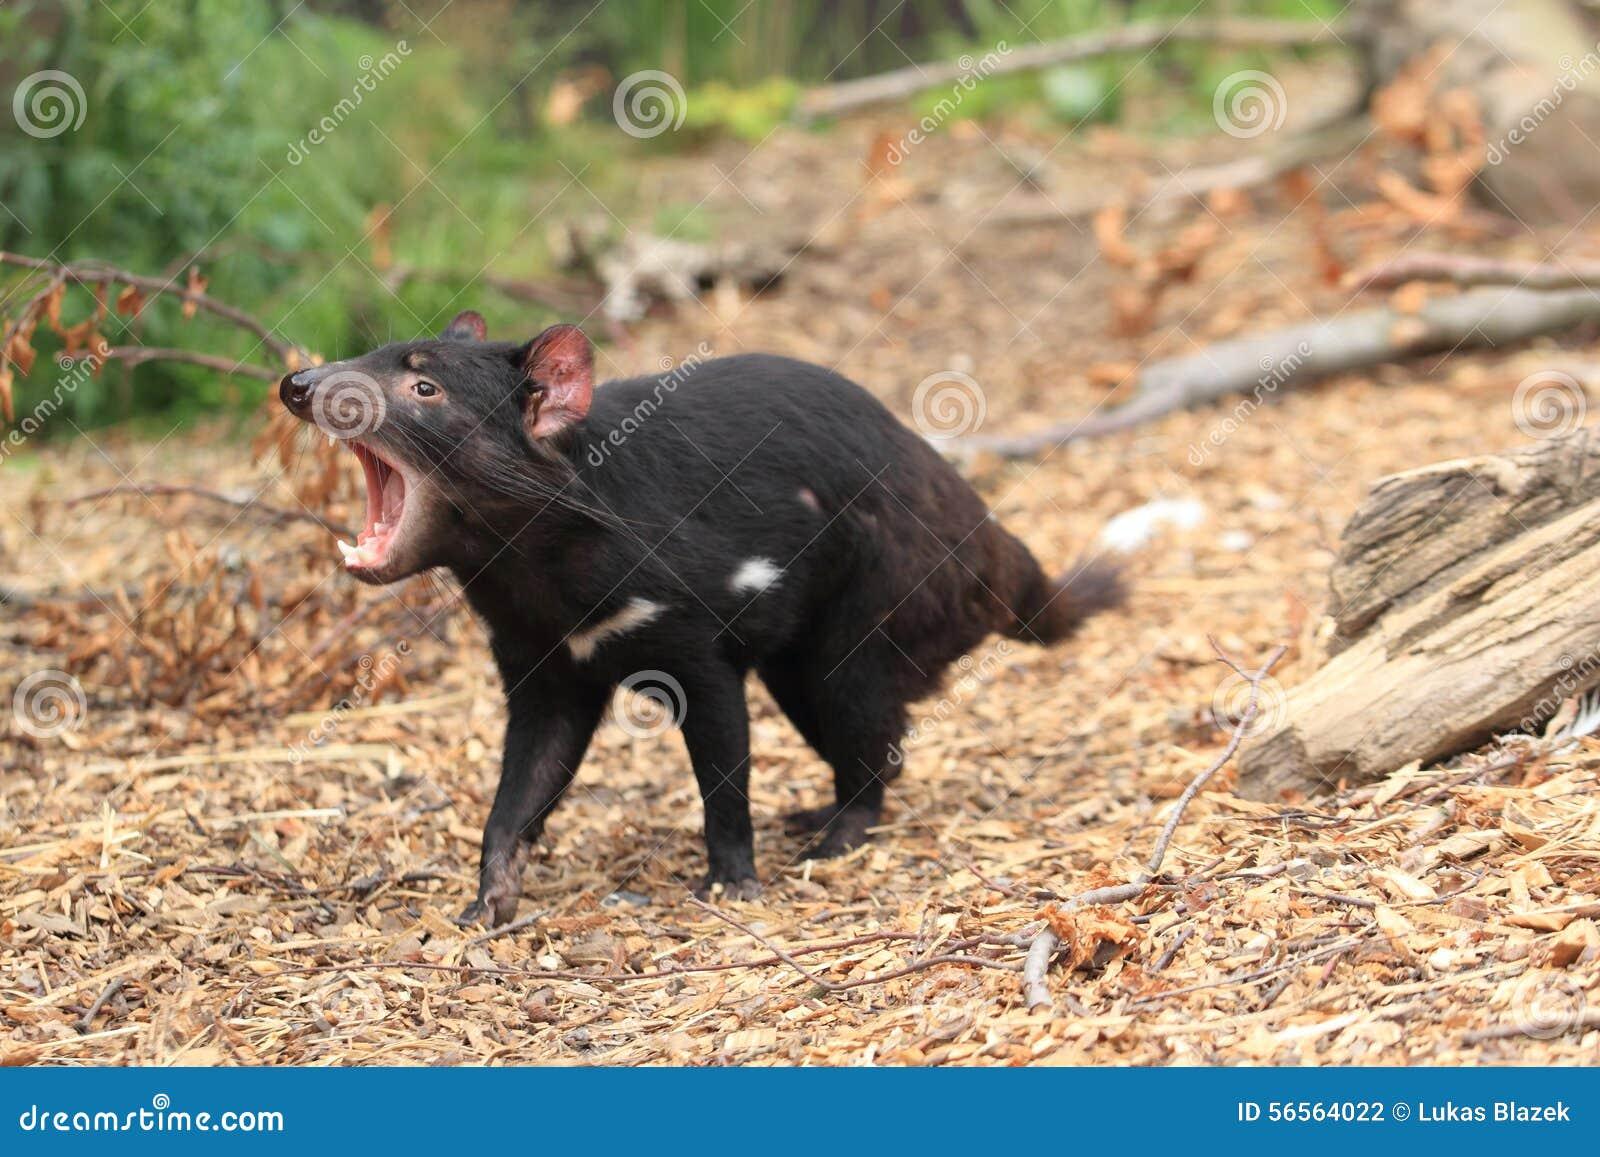 Roaring tasmanian devil